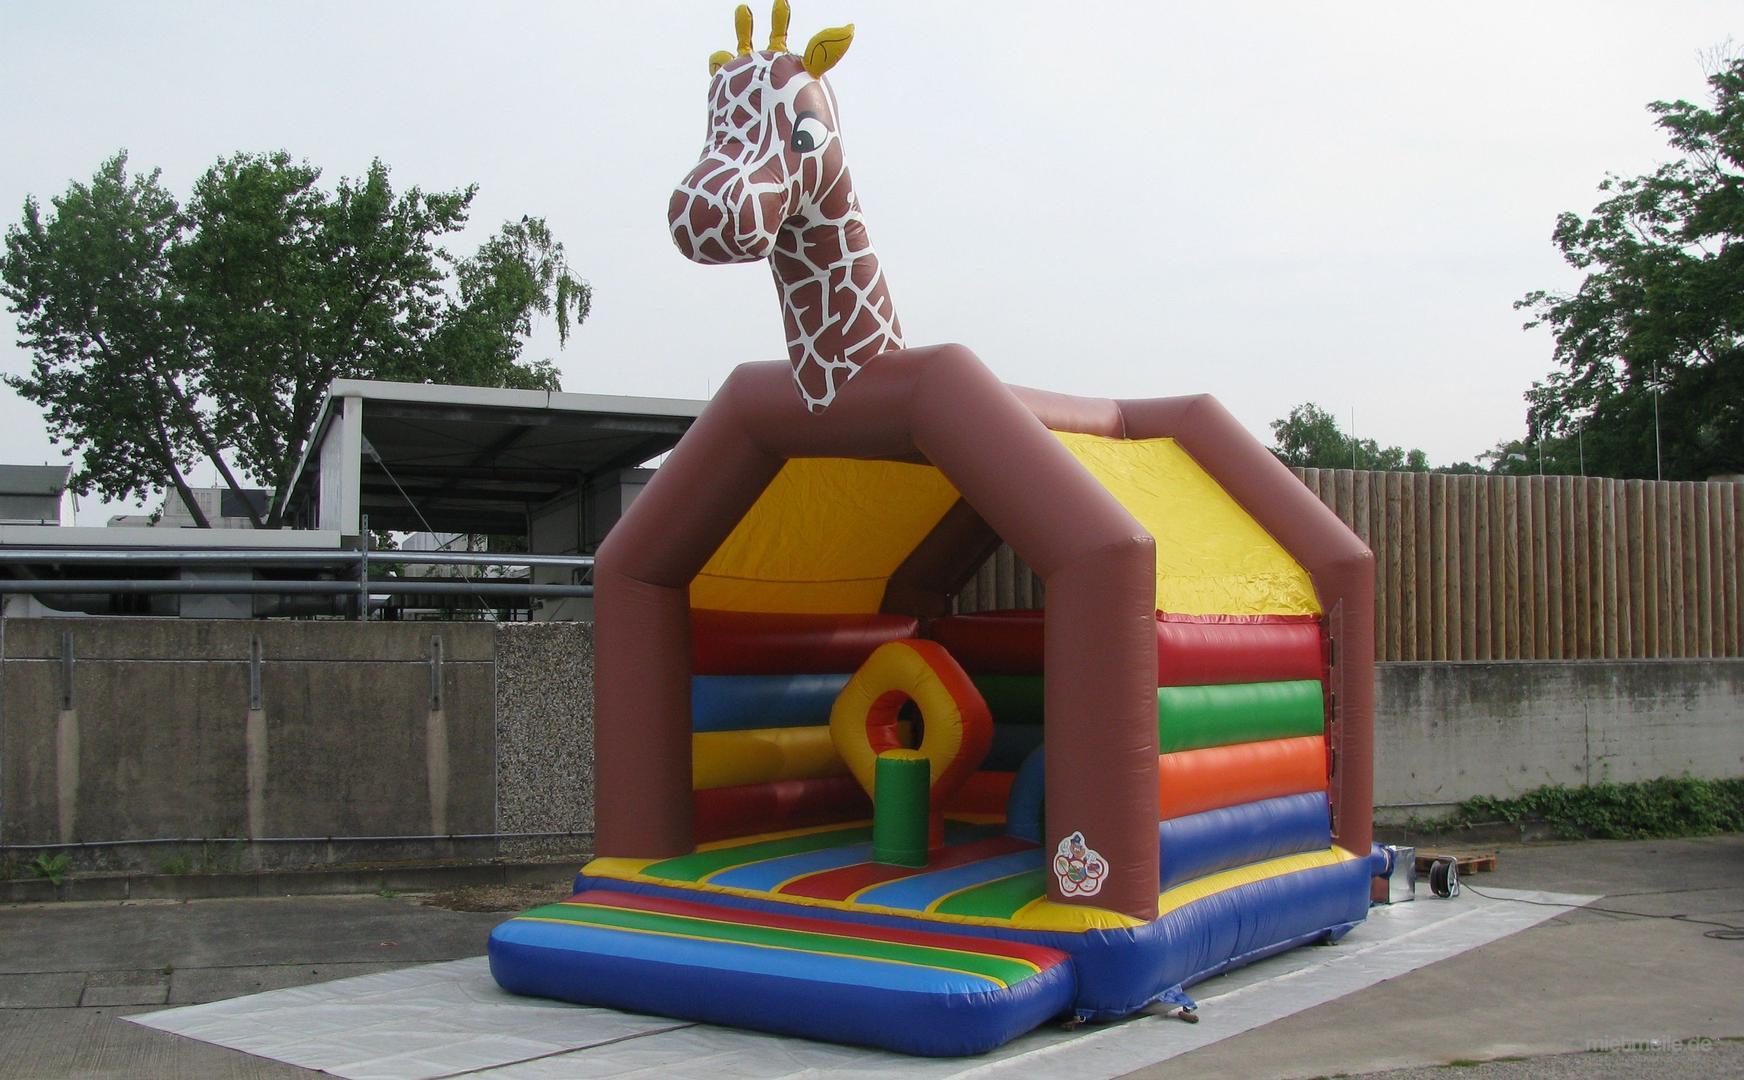 Hüpfburg mieten & vermieten - Hüpfburg 4,0 x 5,2 Multiplay Giraffe in Hannover